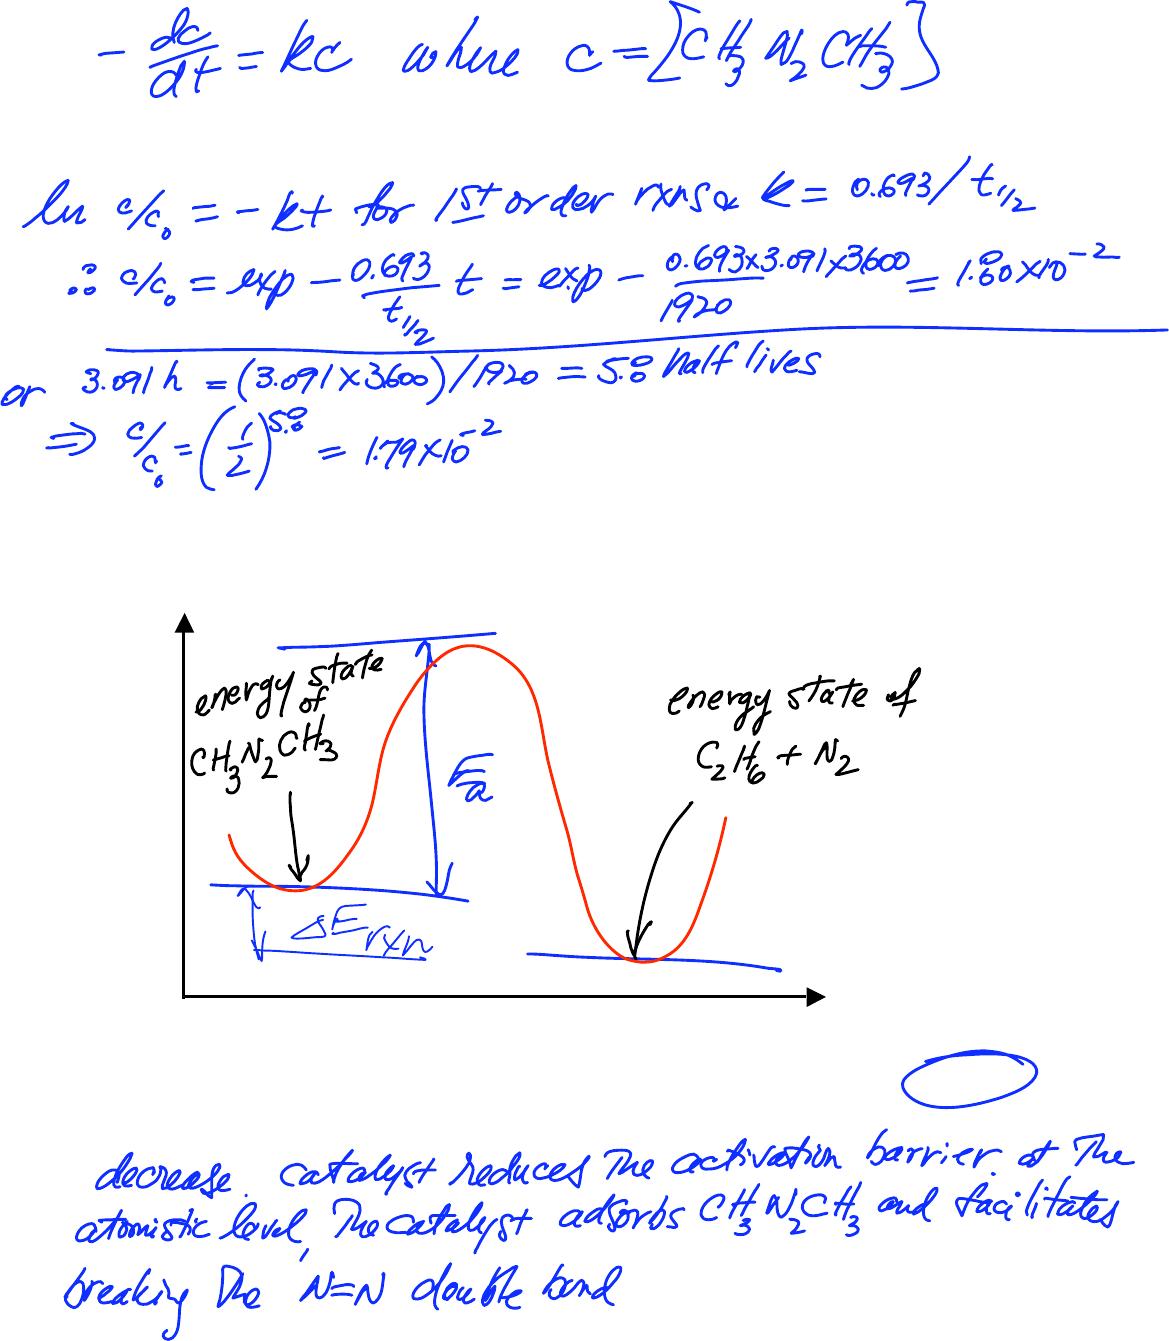 Supplemental exam solutions key (PDF)